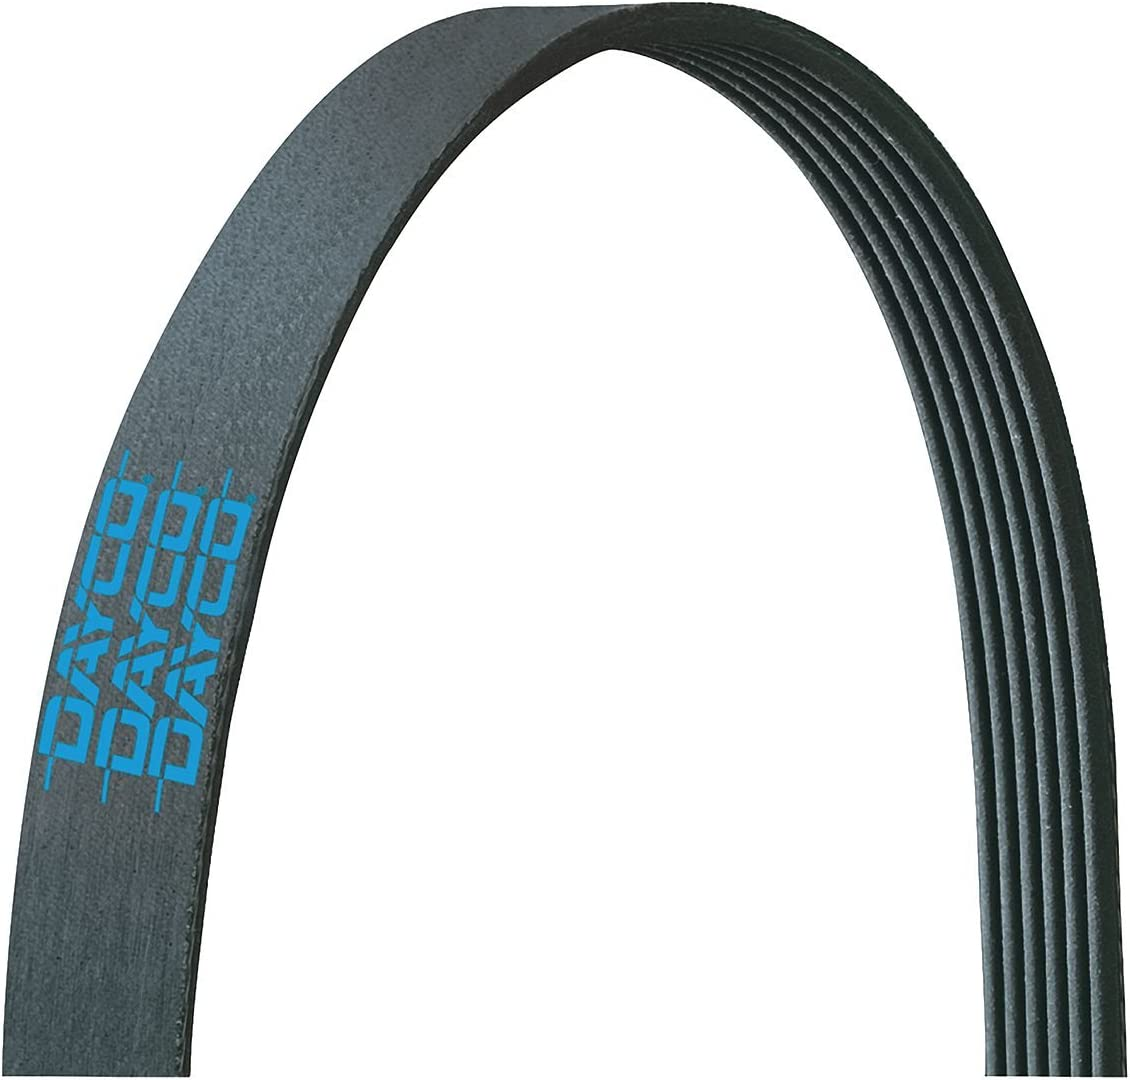 Dayco 5150580 Automotive Accessories